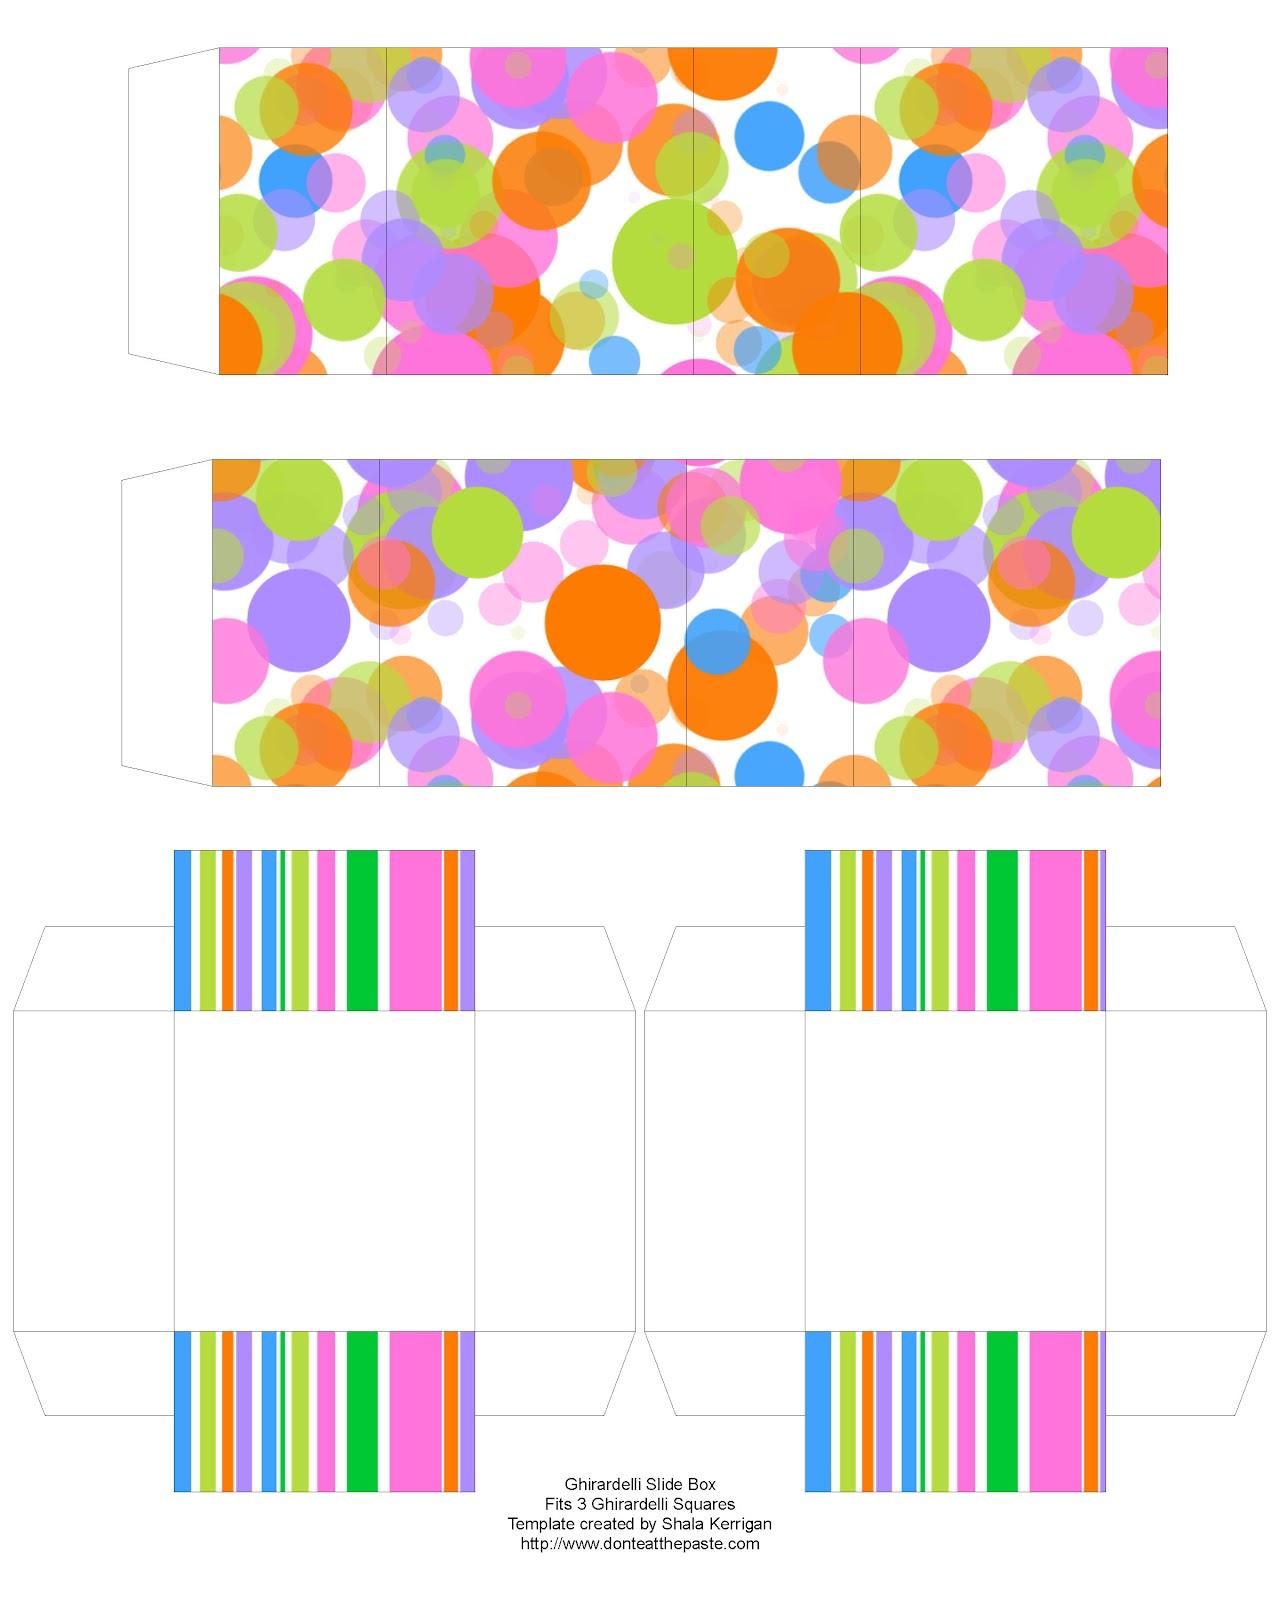 Color Slides Of New York City April 1979: Don't Eat The Paste: Spring Color Slide Box- Ghirardelli